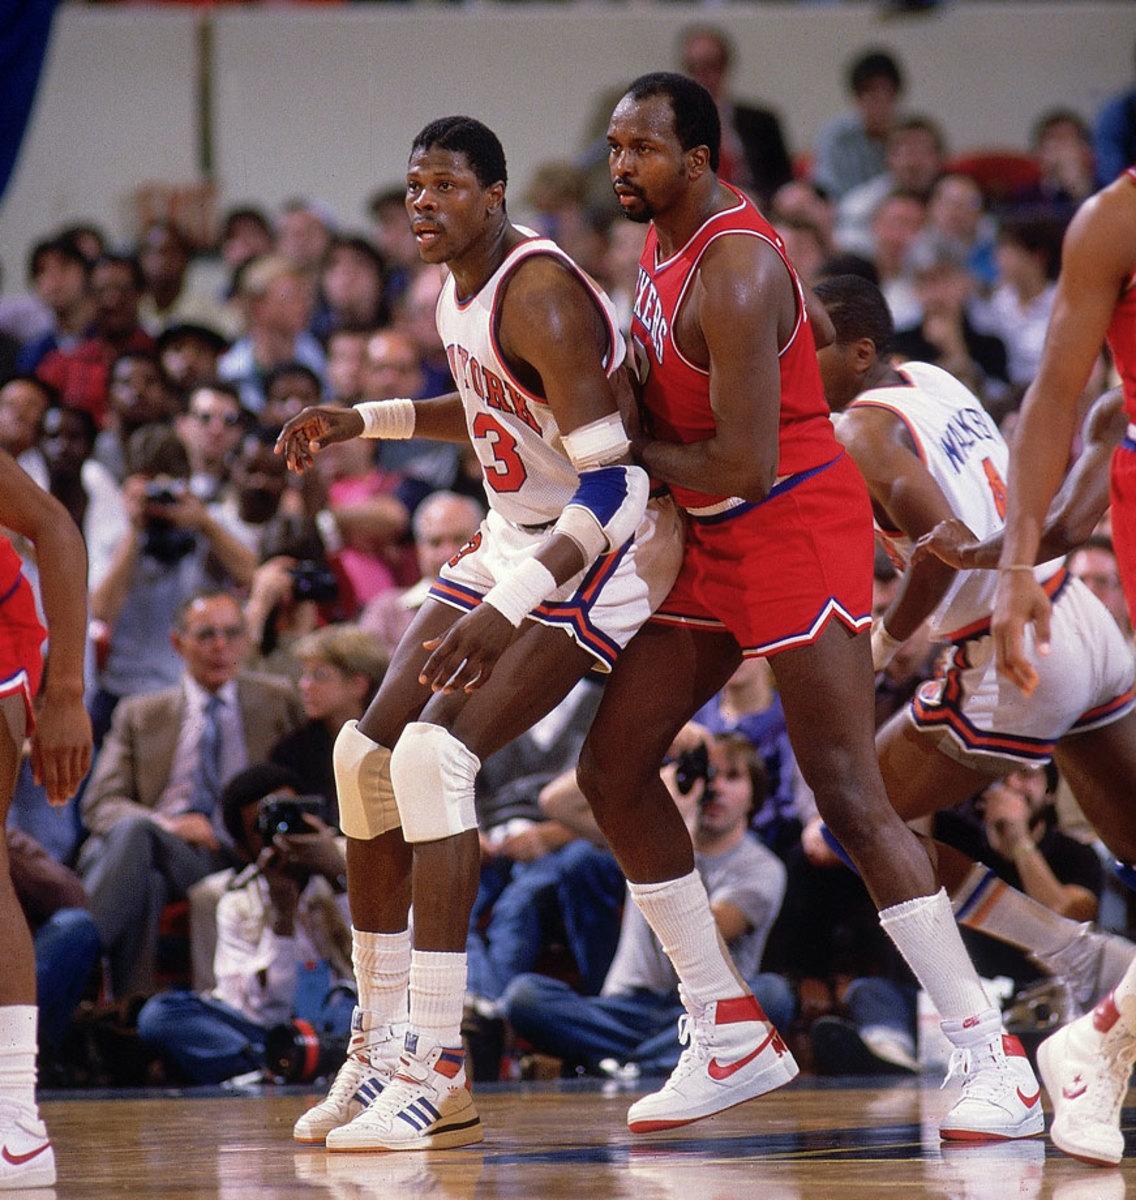 1985-Patrick-Ewing-Moses-Malone-001308708.jpg